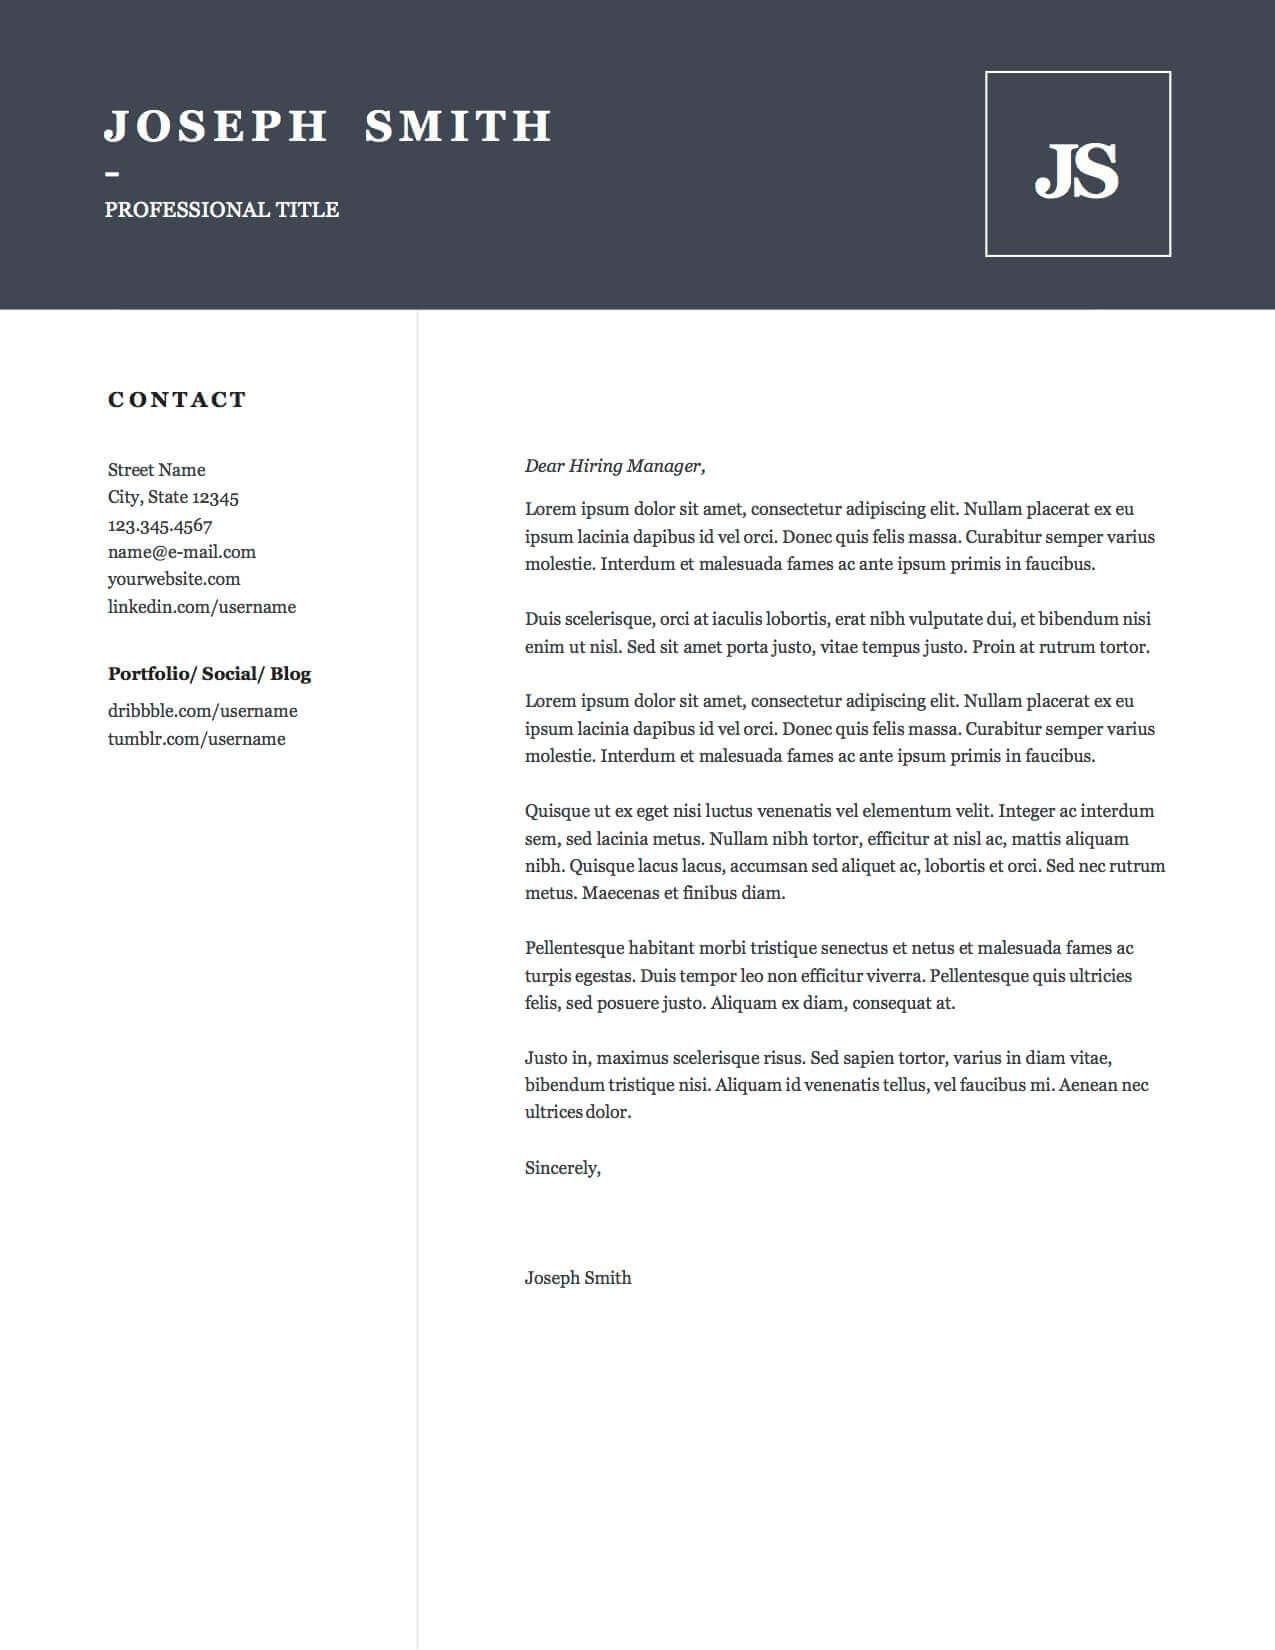 Design 3-Cover Letter